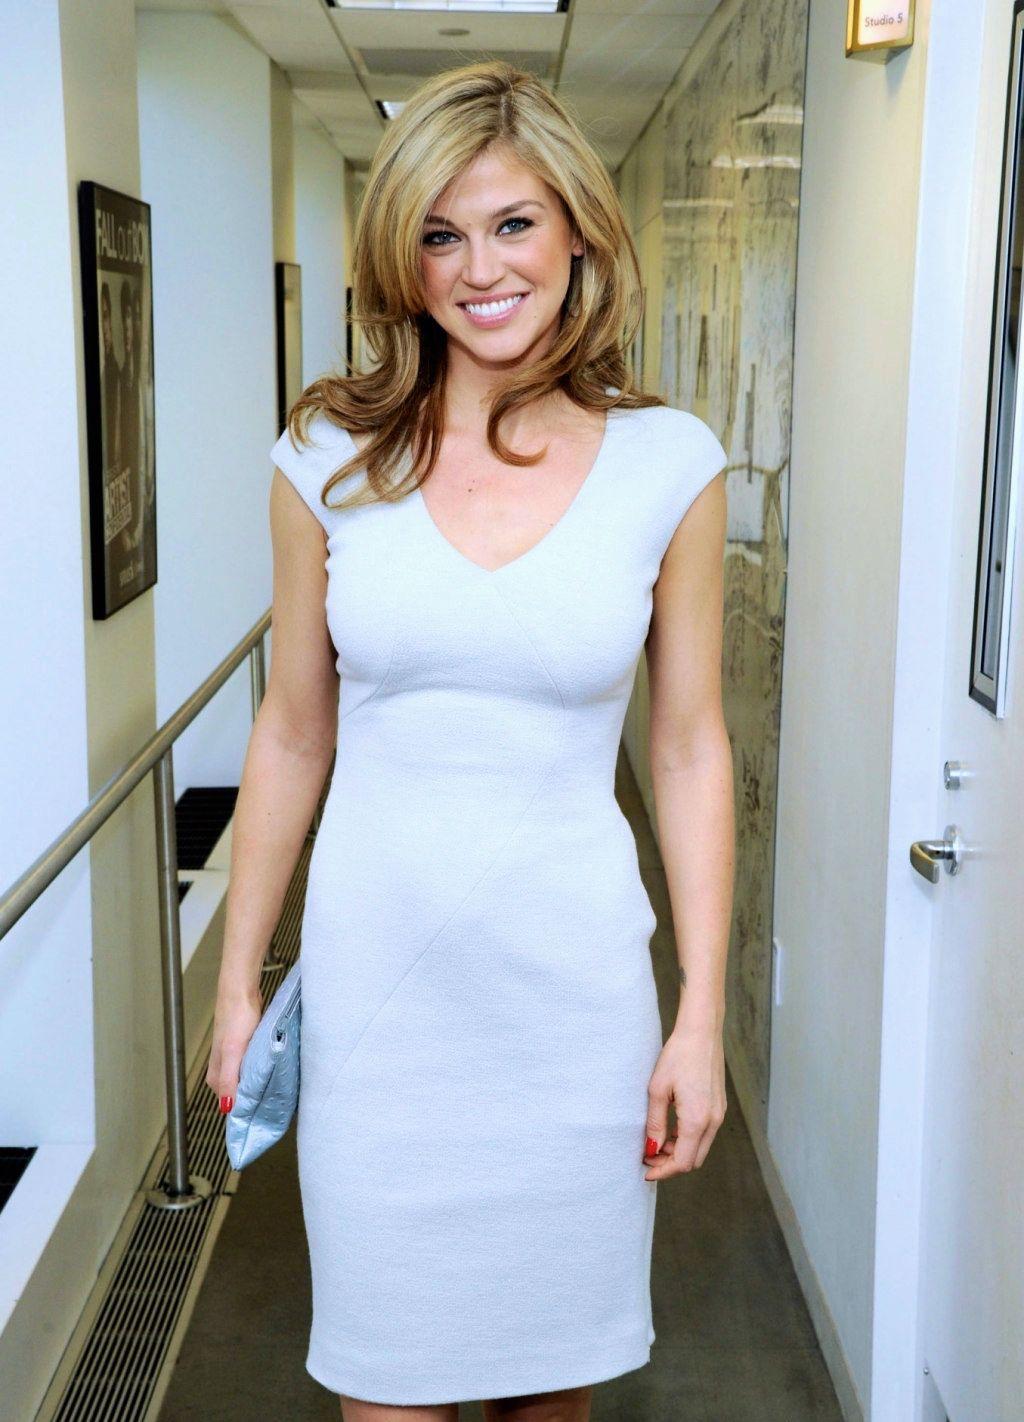 Adrianne Palicki lovely in a white mini dress | Celebrities in a ...